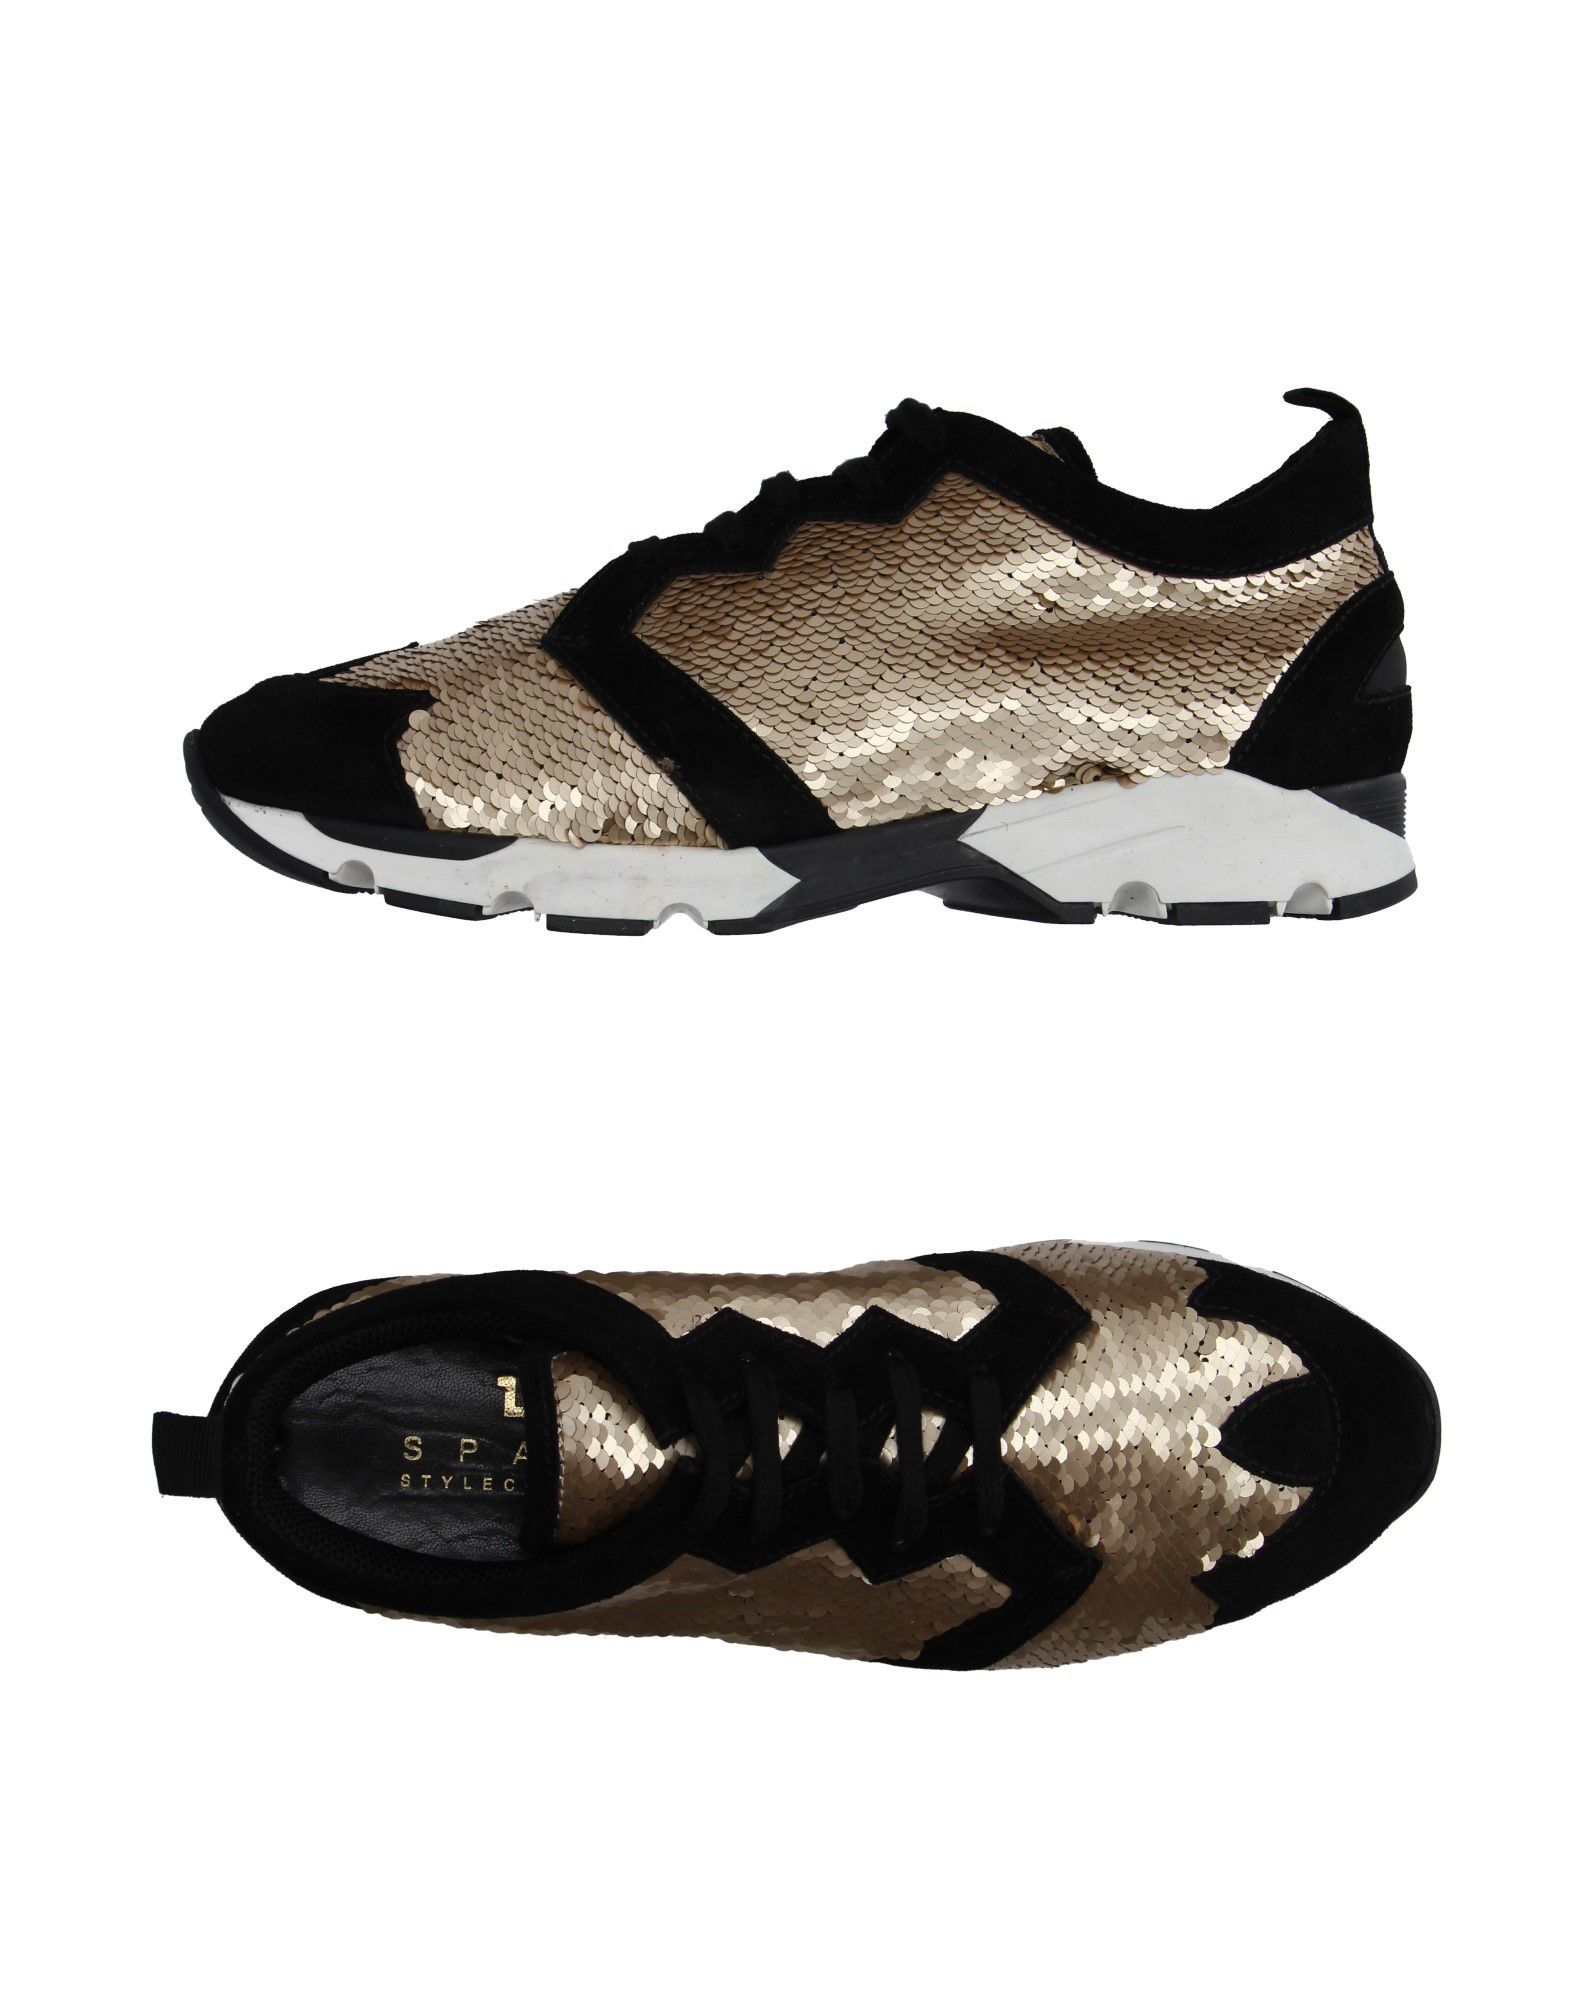 Space Style Concept Sneakers Damen Damen Damen  11091453RT Neue Schuhe a6ed6c